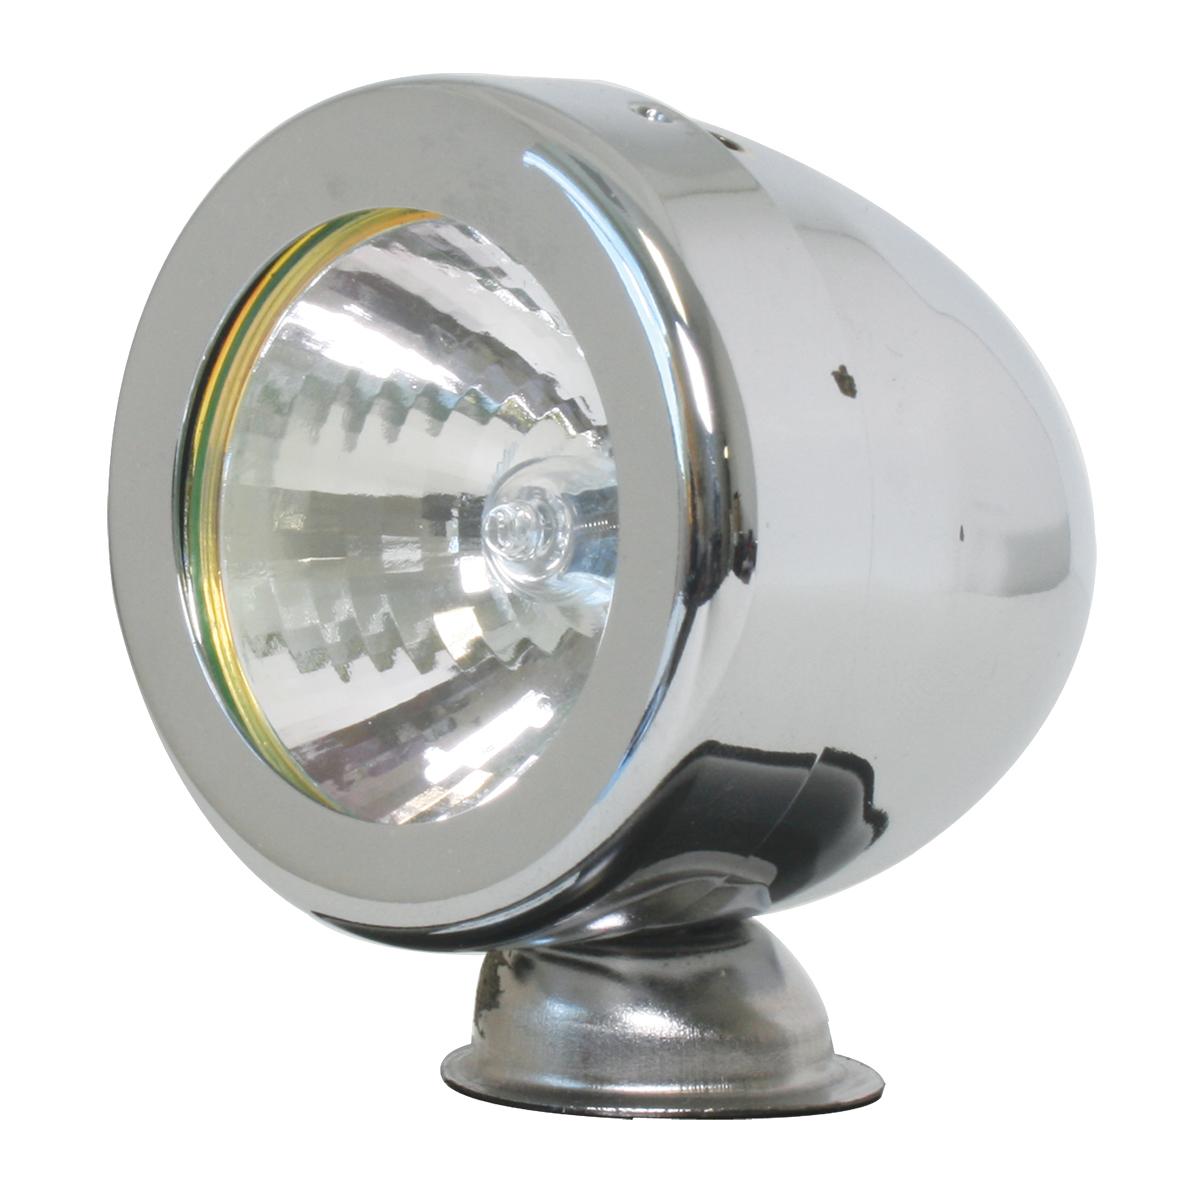 #81532 Mini Fog Light Assembly - Clear